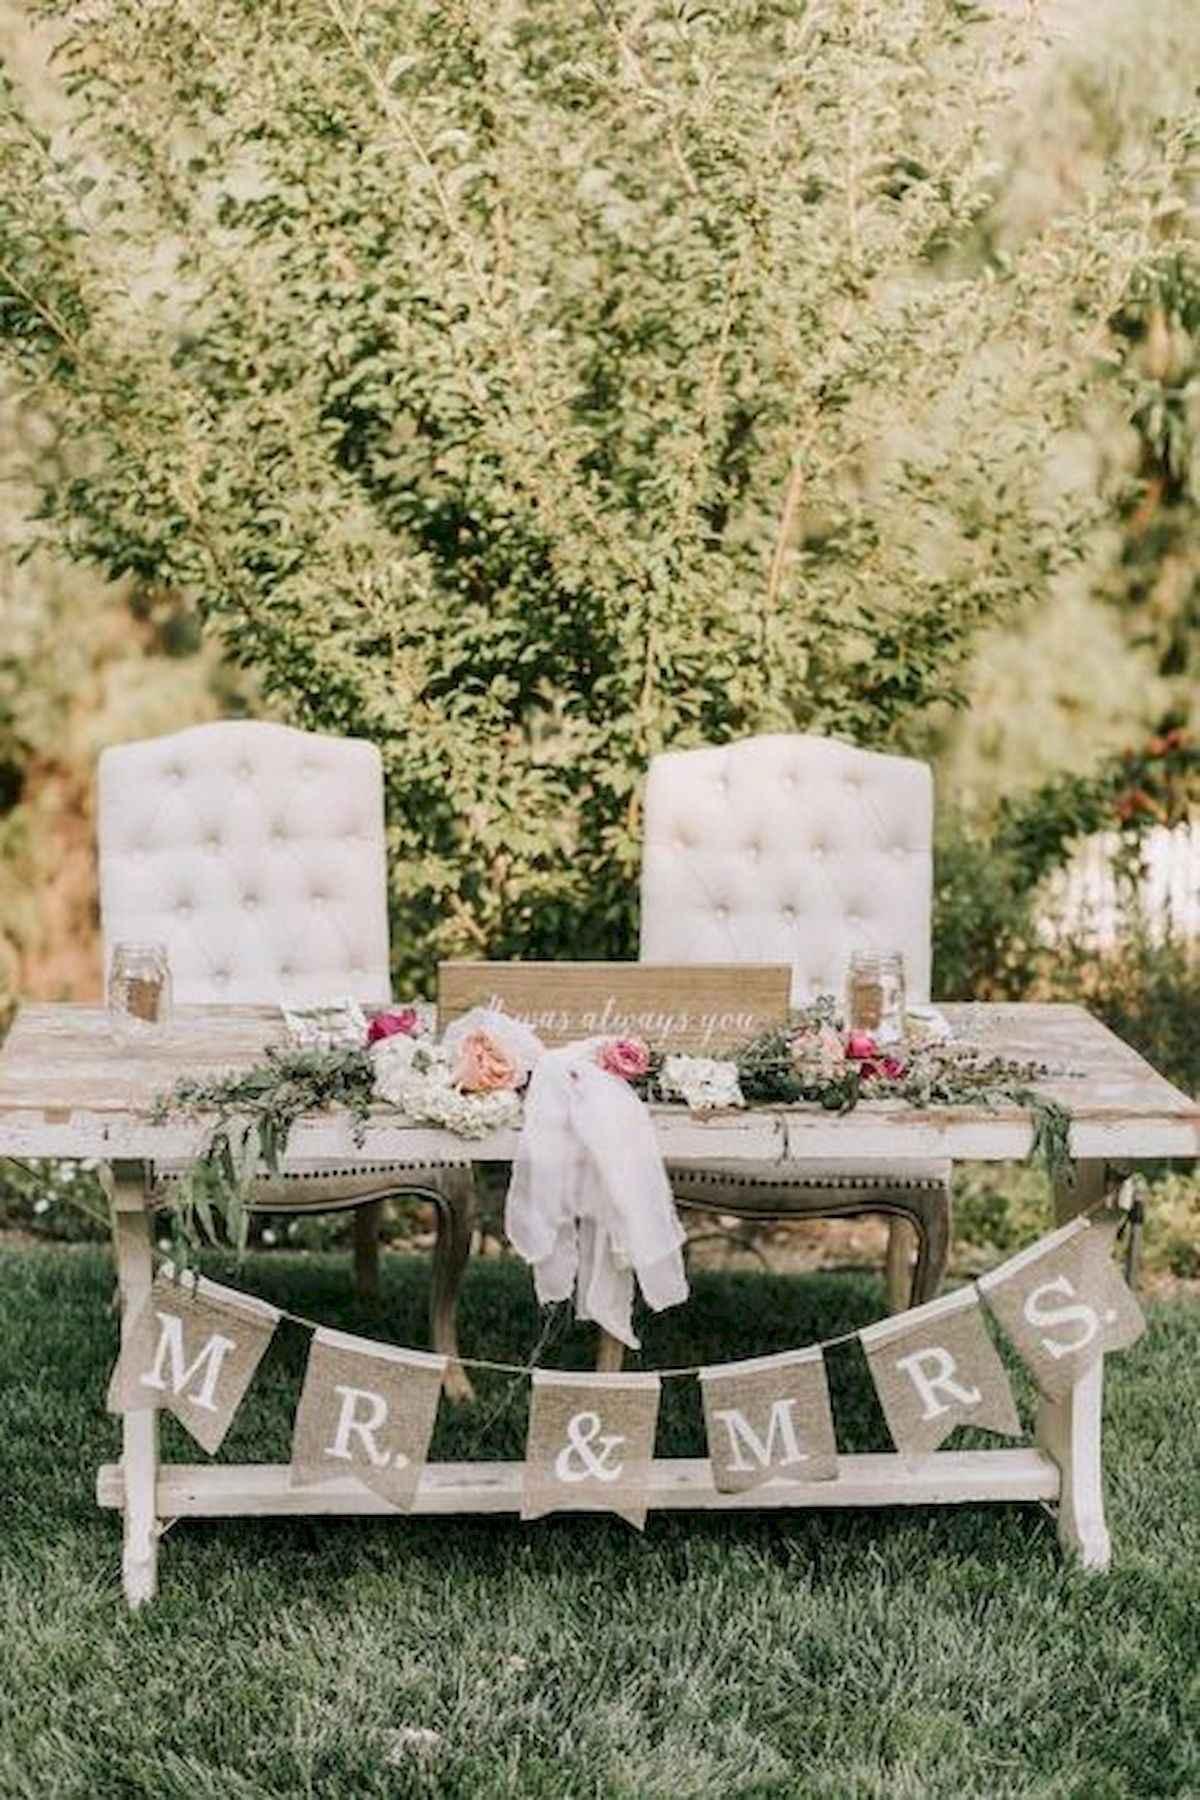 Stunning Backyard Wedding Decor Ideas